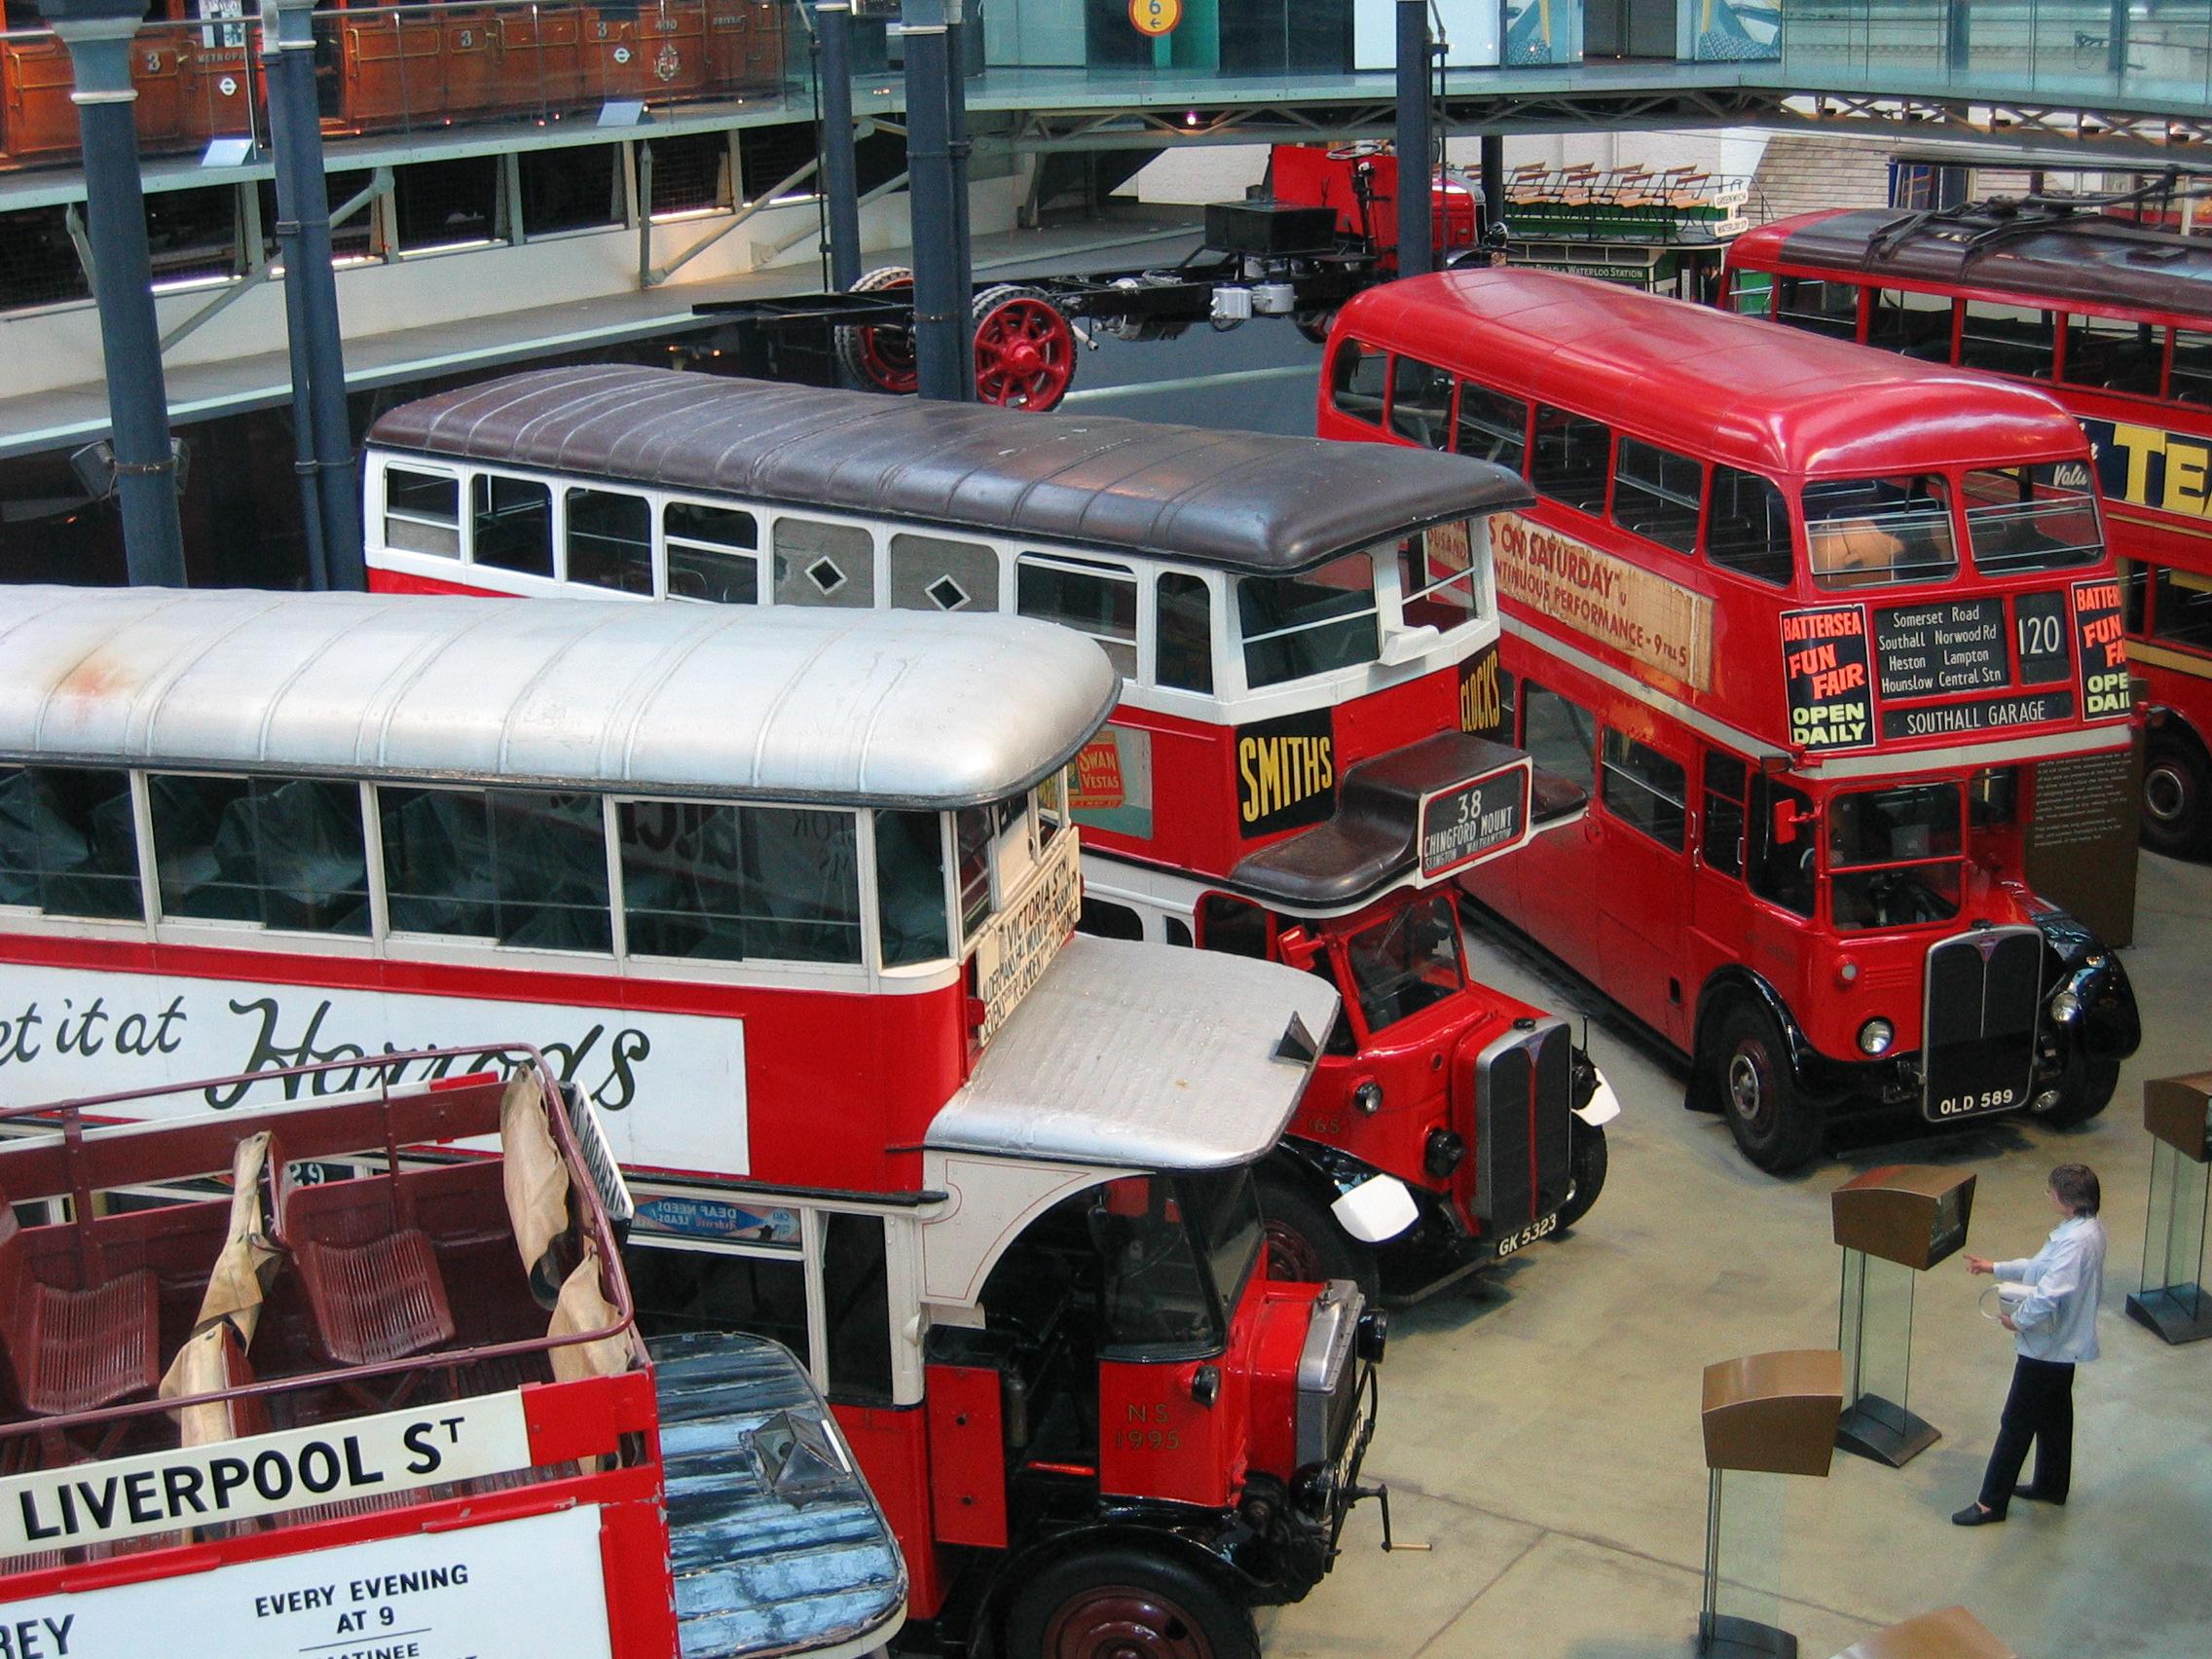 London Transport Museum Archives - Londontopia